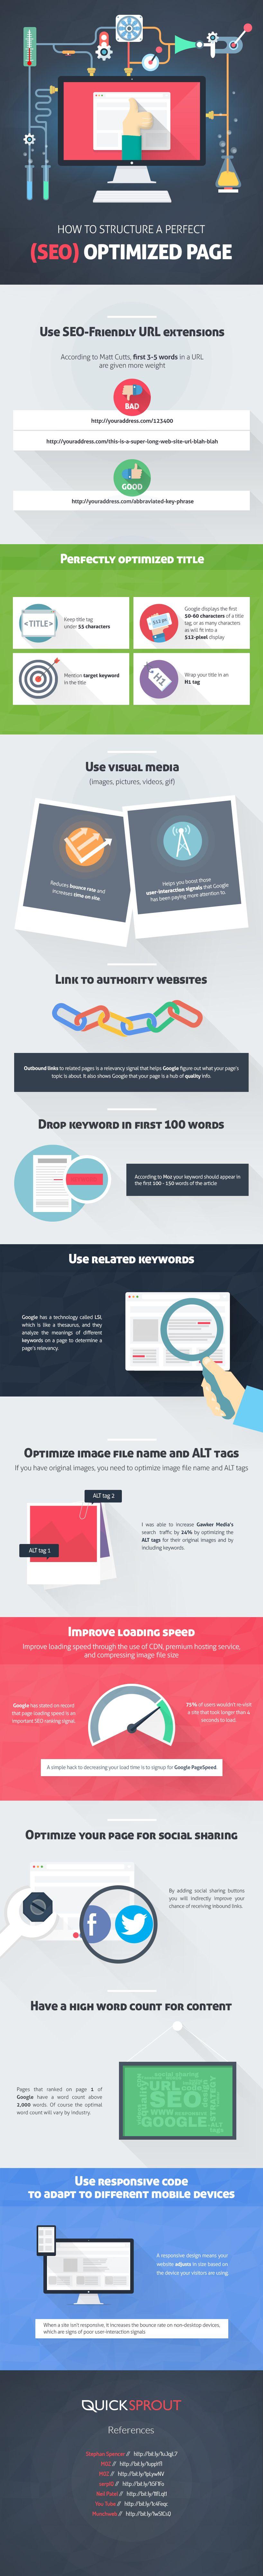 SEO checklist infographic